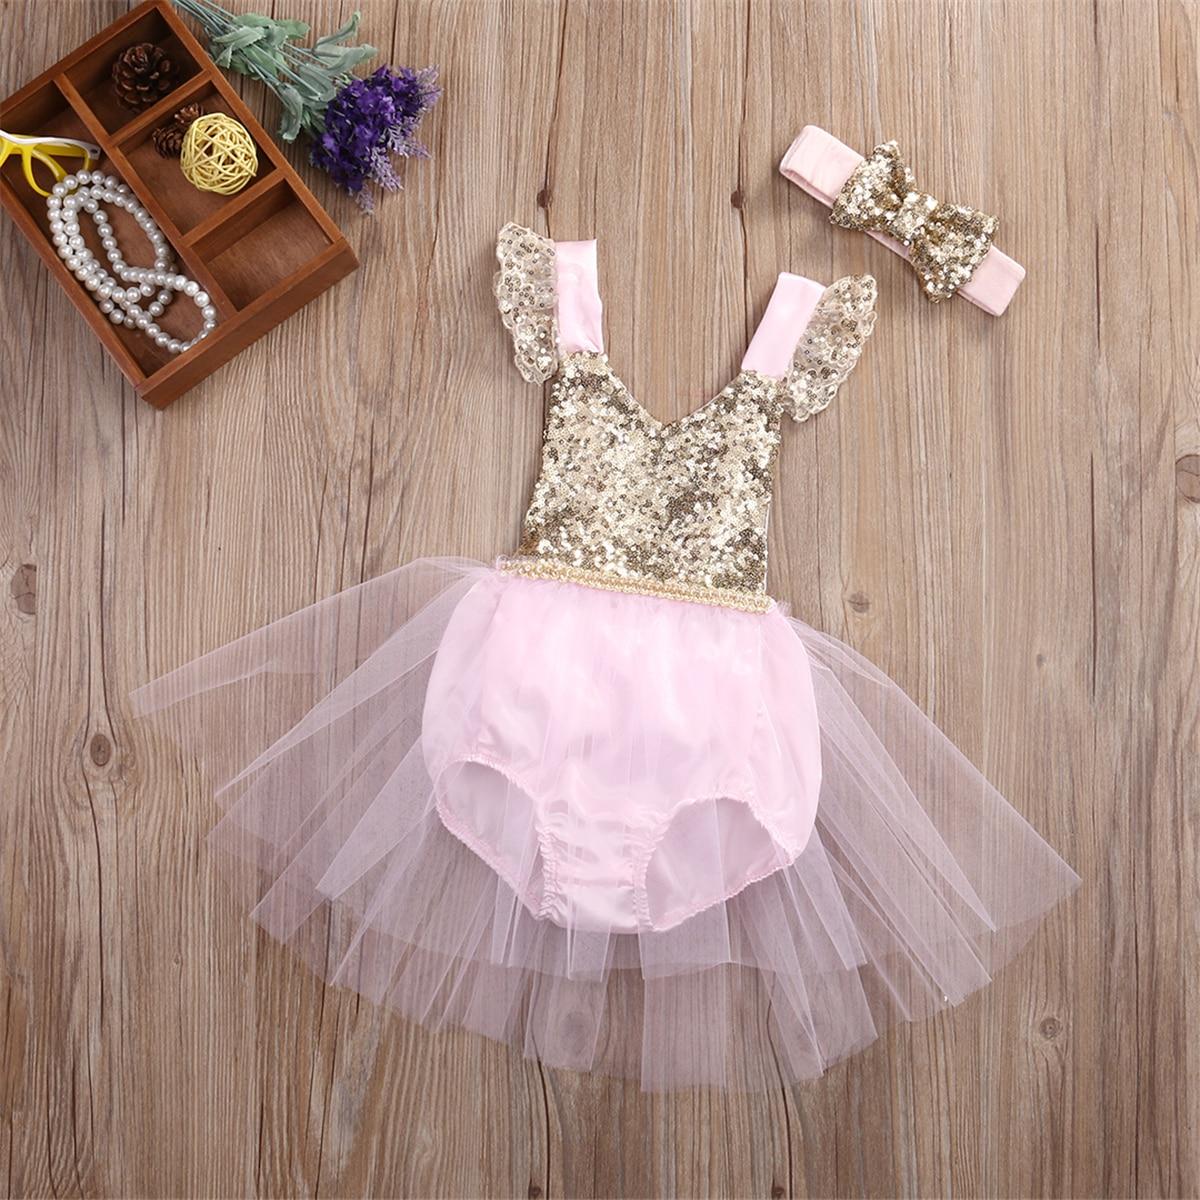 Emmababy Toddler Baby Girls Clothing Princess Dress Party Tutu Flower Dress 0-3 Year